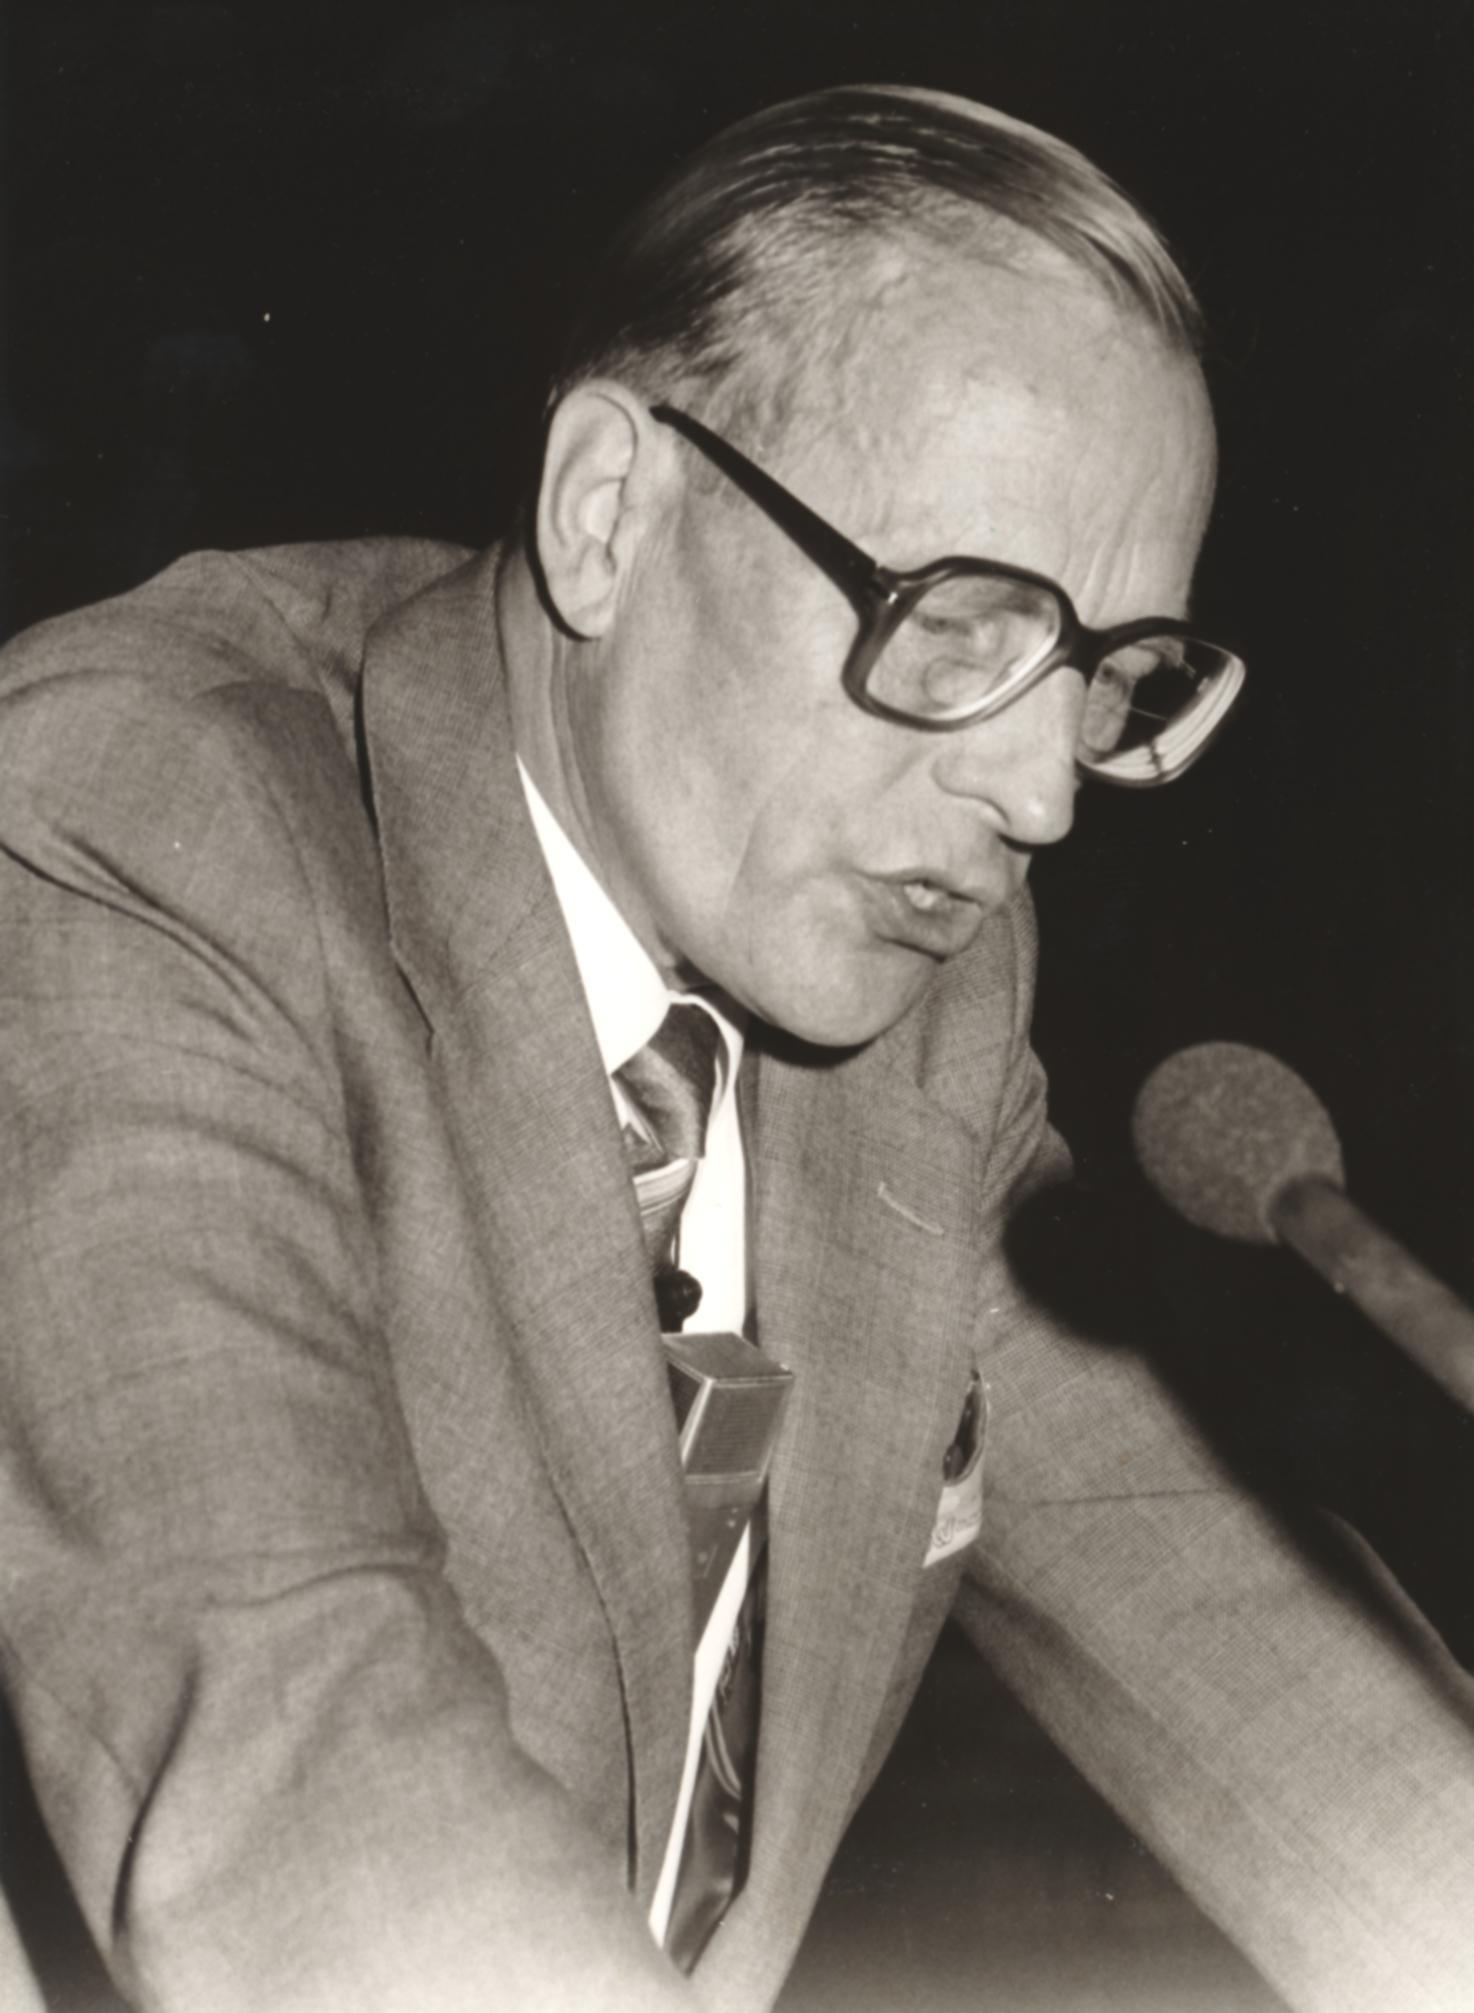 IX. Imago Mundi-Kongress 1982, Innsbruck, Prof. Dr. Hans Jürgen Bretschneider